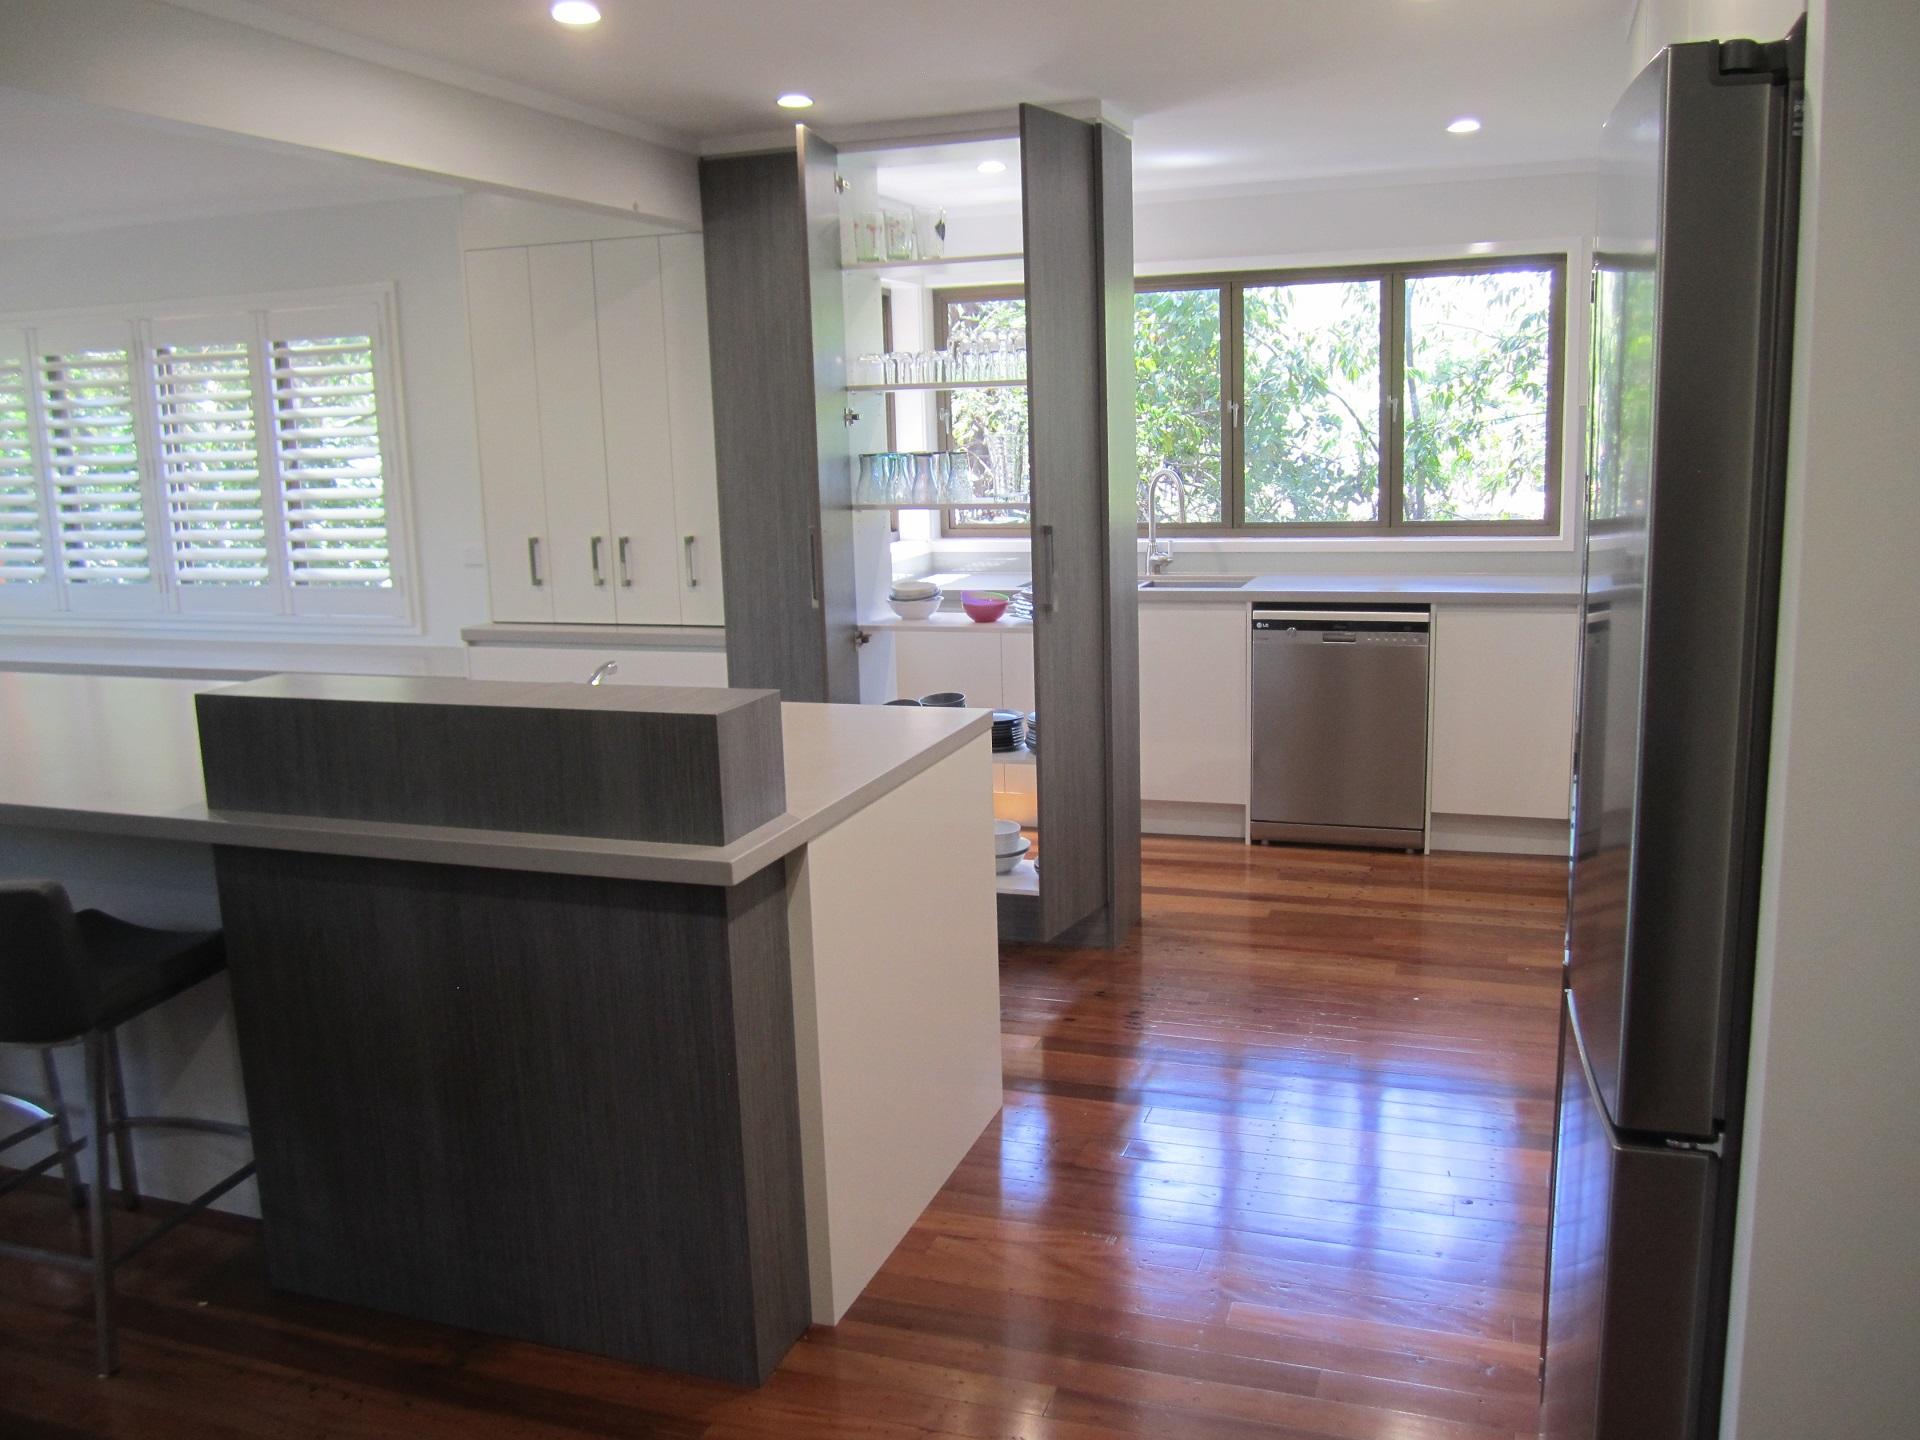 Brisbane Kitchen Design Kenmore Contemporary 2 Tone Raised Servery (5)